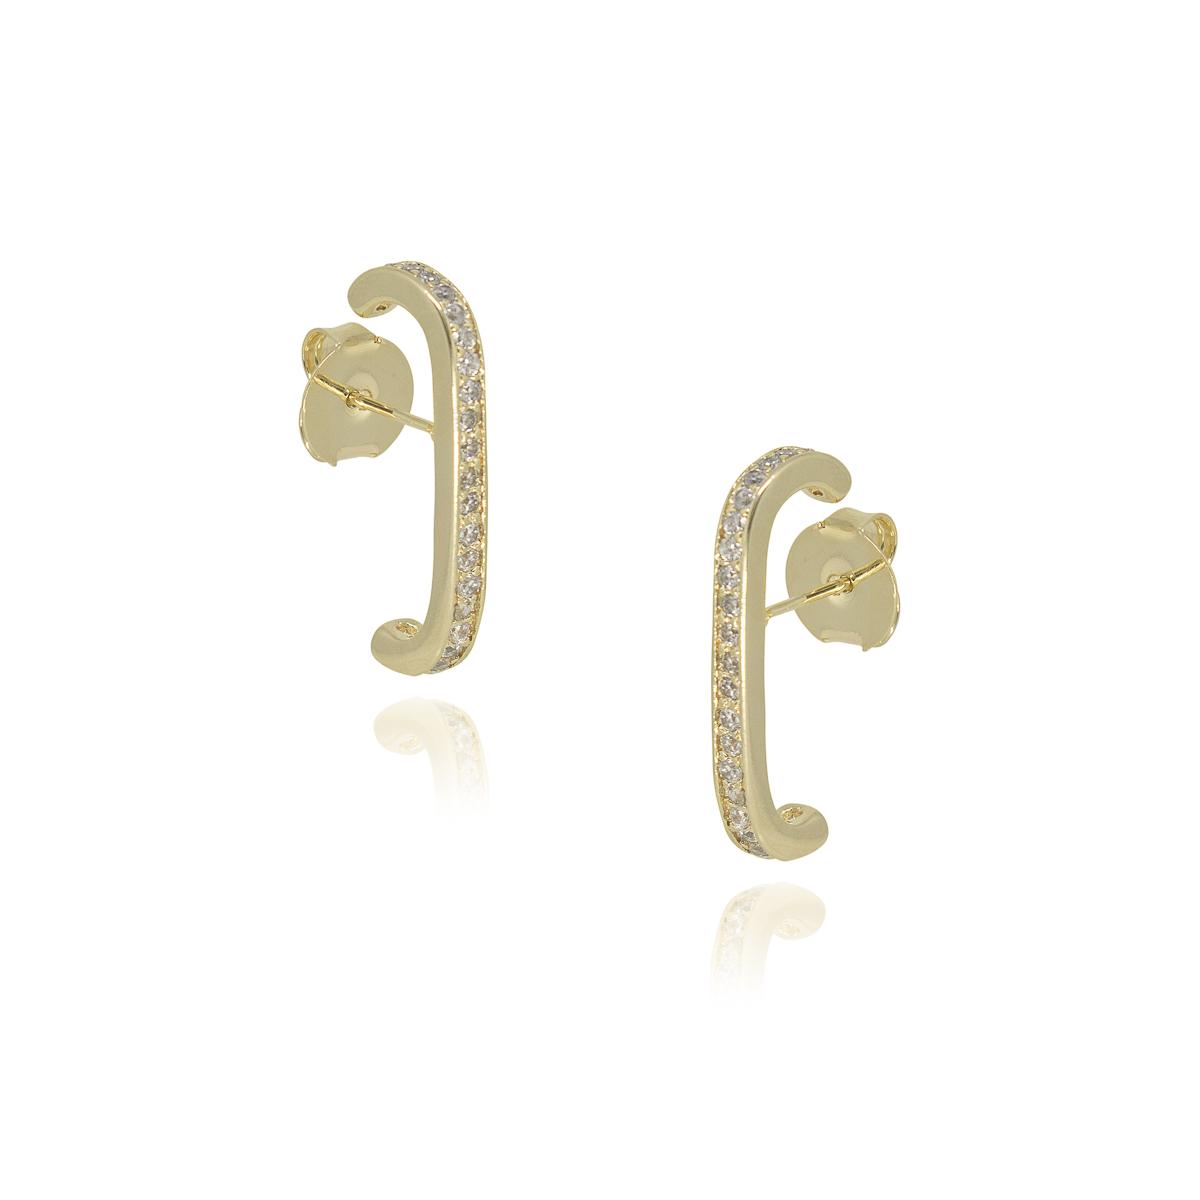 Brinco Earhook Semi joia folheada a ouro cravejado zircônia